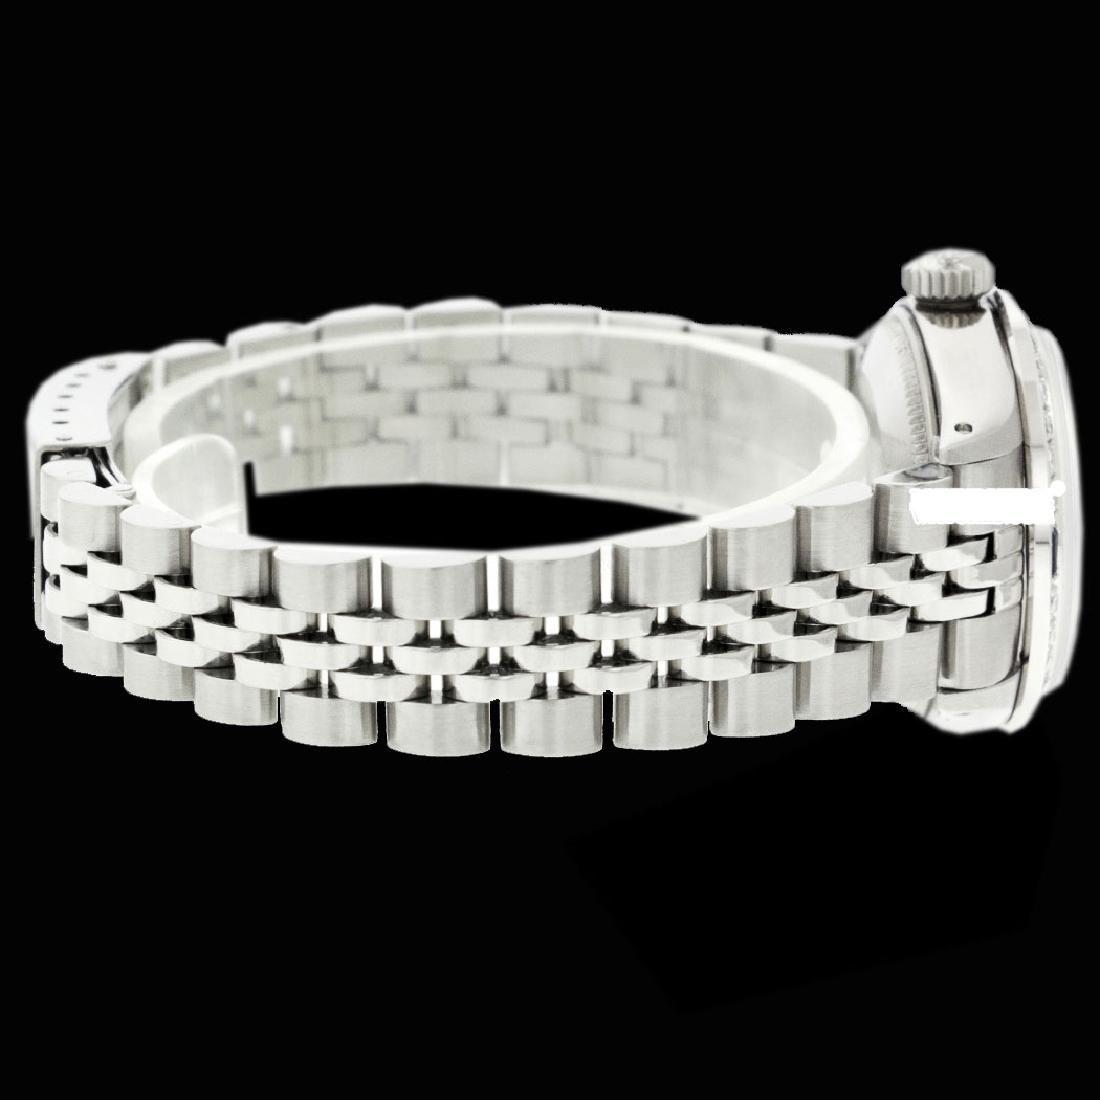 Rolex Men's Stainless Steel, QuickSet, Diam Dial & - 2